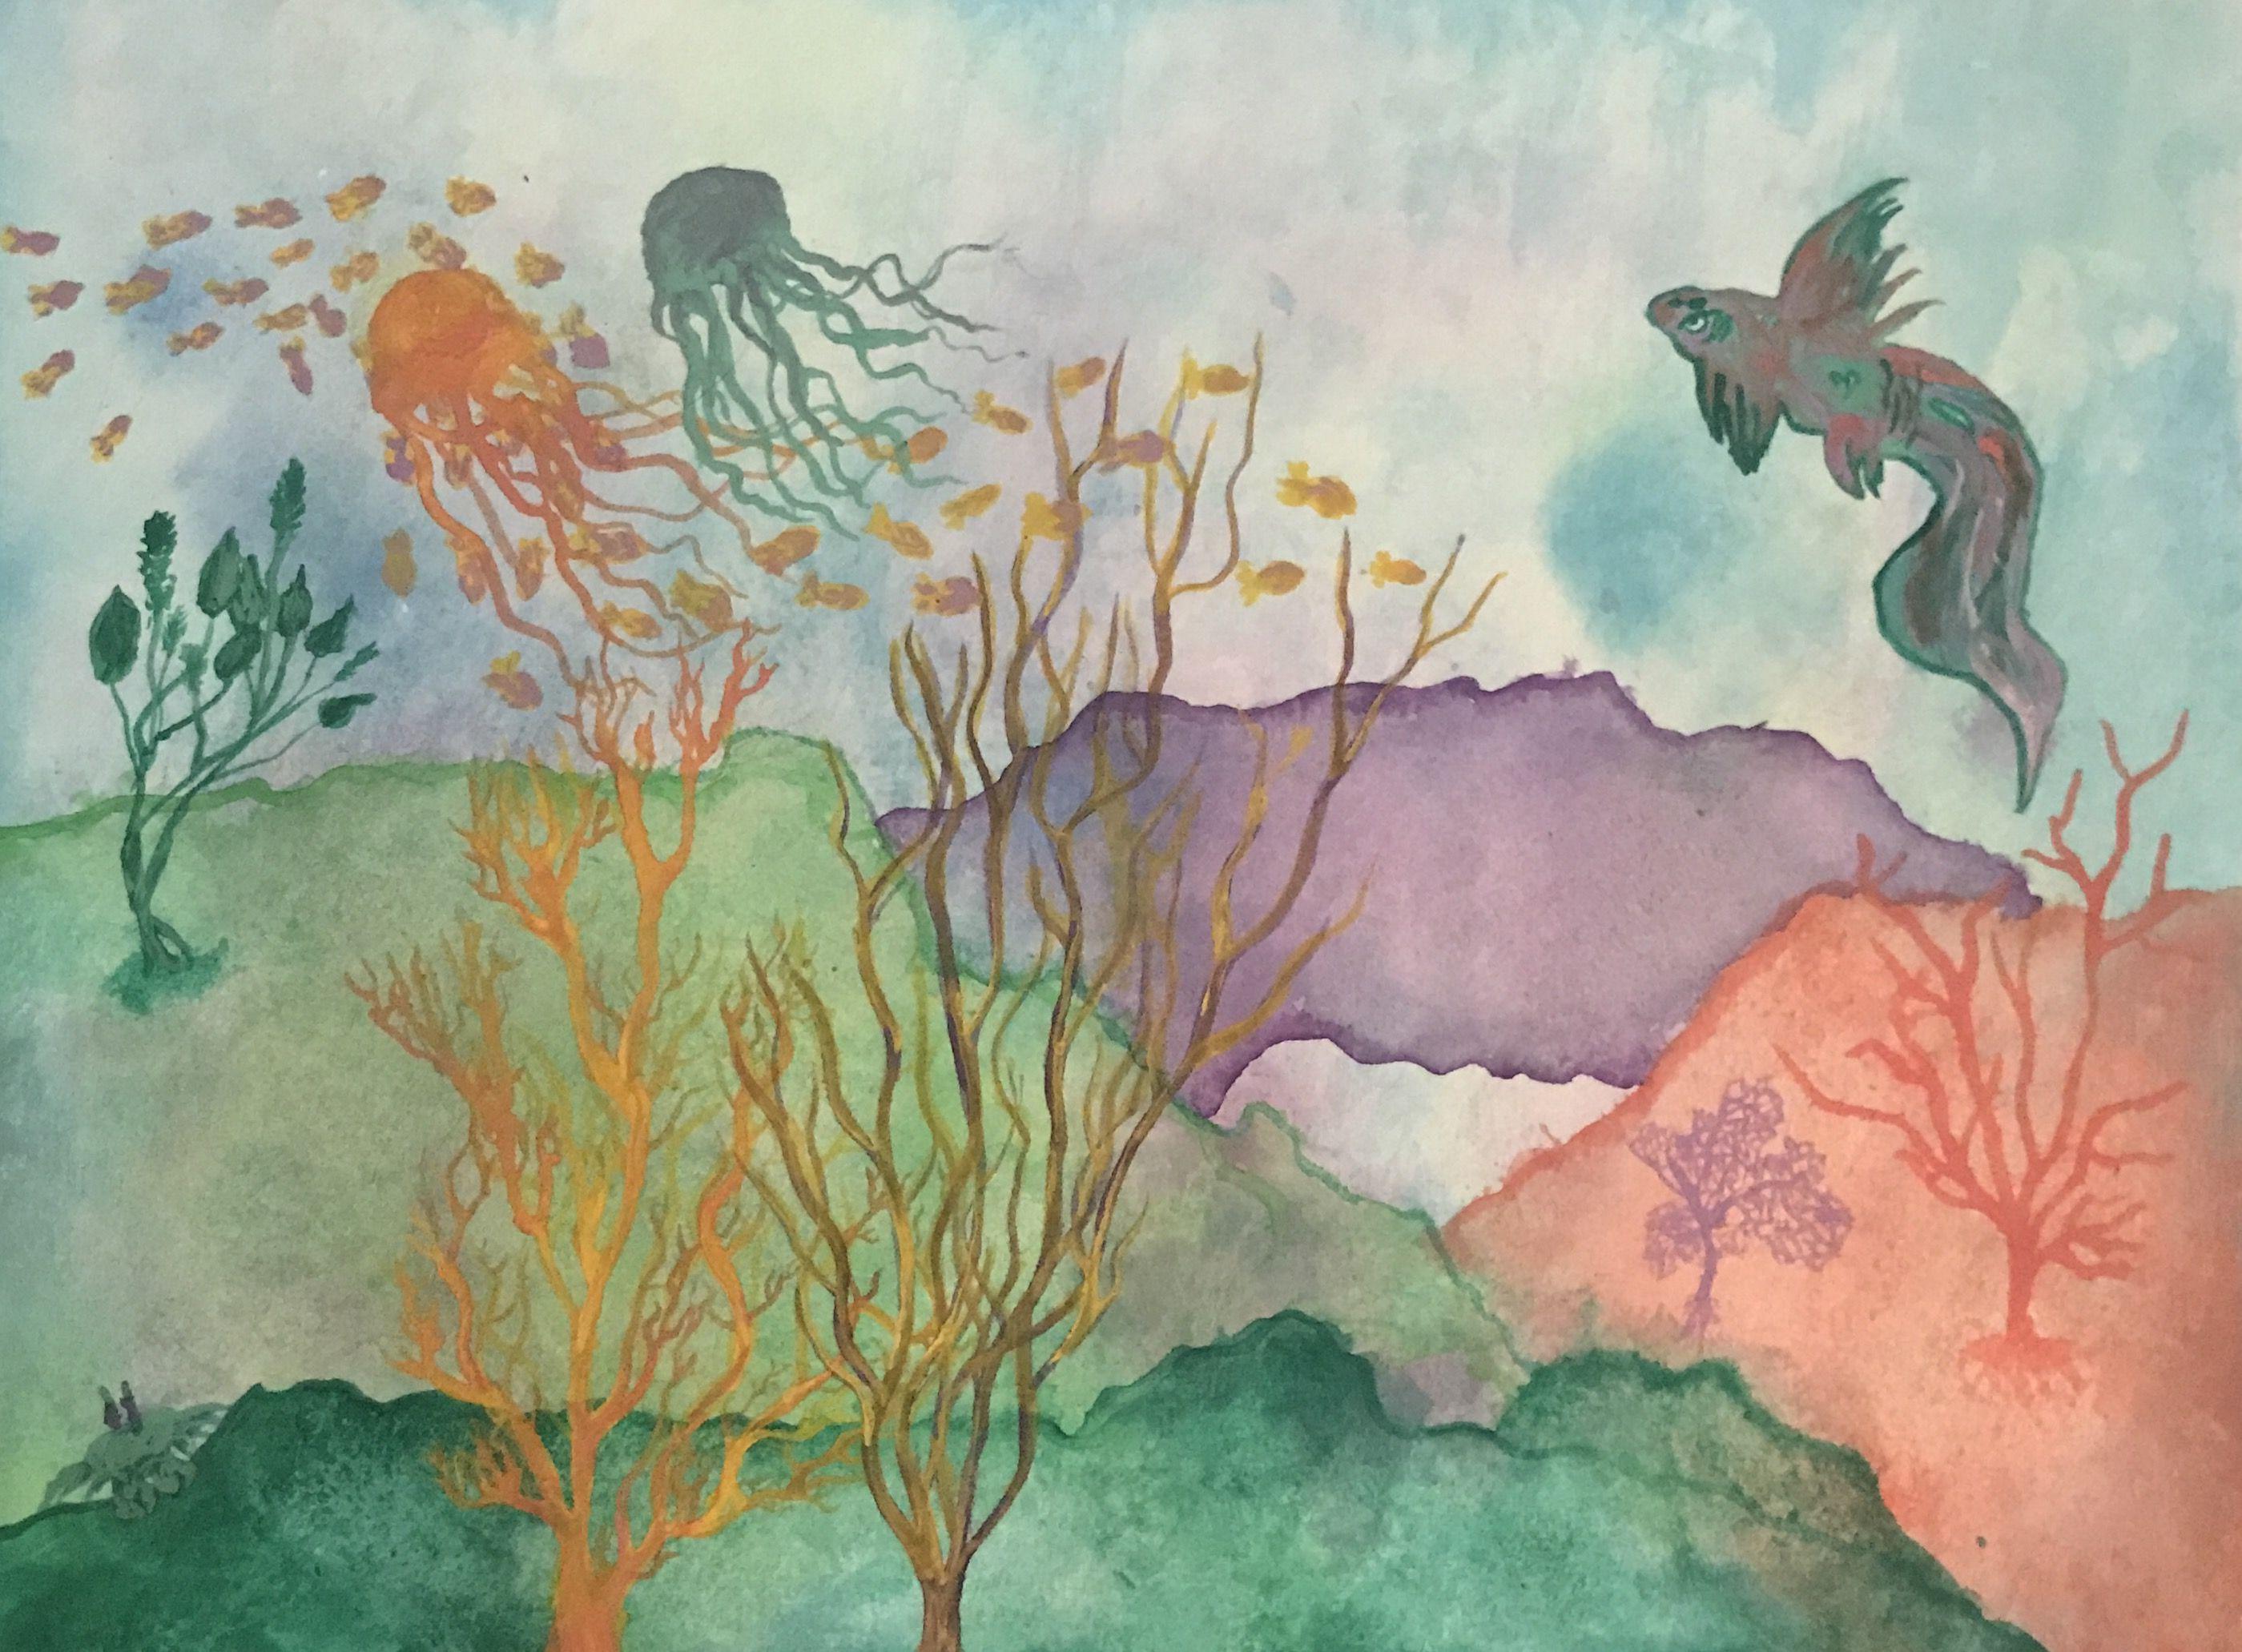 Original watercolor art for sale -  Alive Original Watercolor Painting By Caroline Beyermann 9x12 Inches For Sale